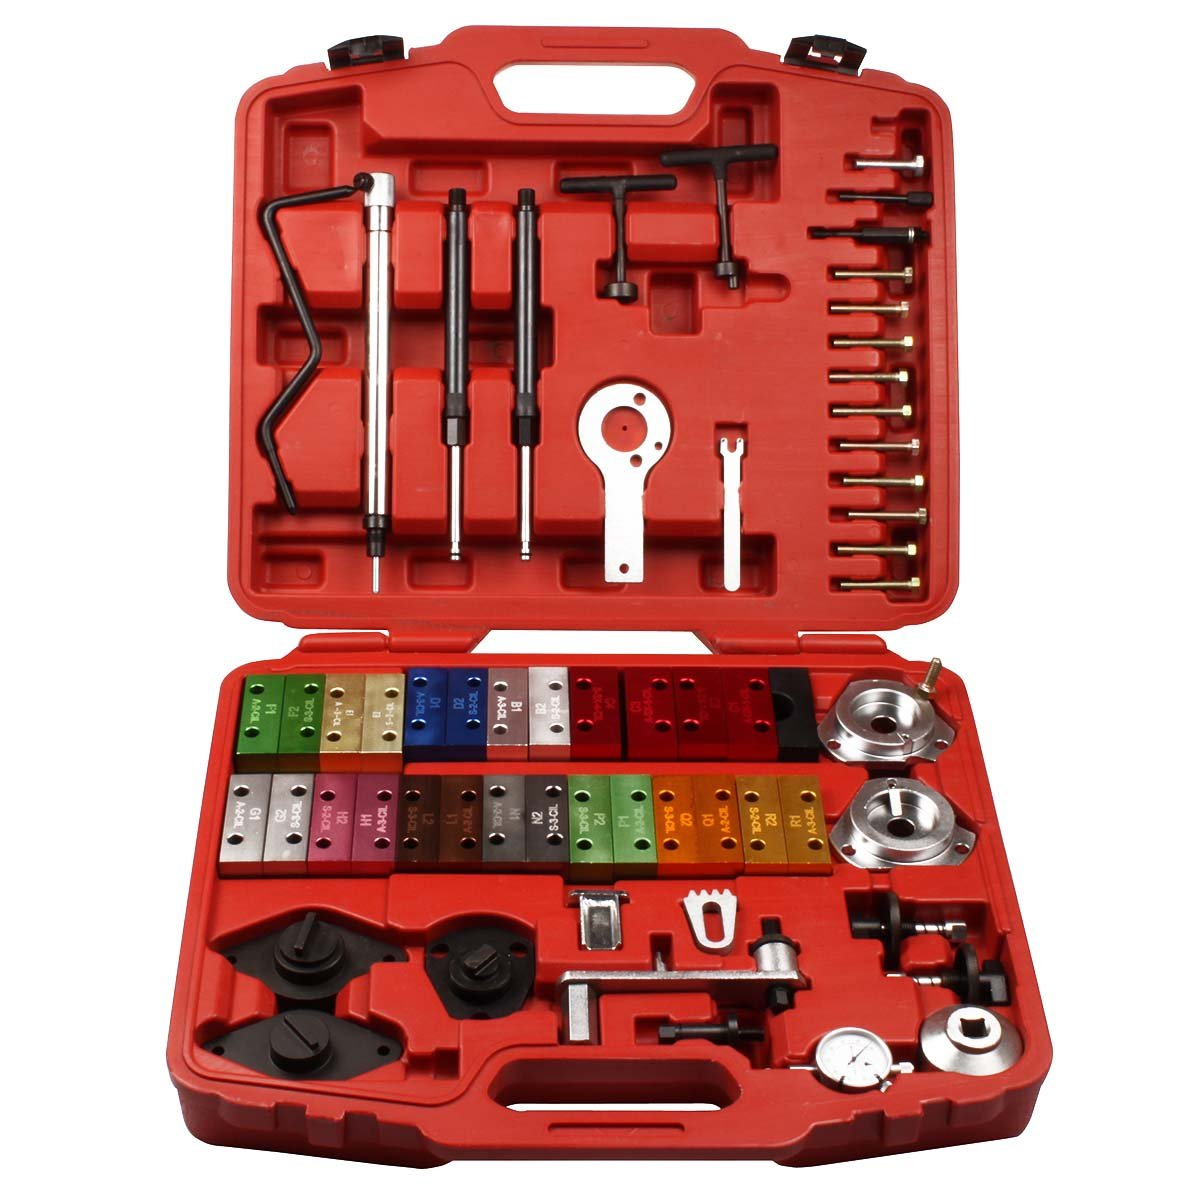 Ctool 63PCS Fiat/Alfa/Lancia Engine Timing Tool Kit by Ctool (Image #1)